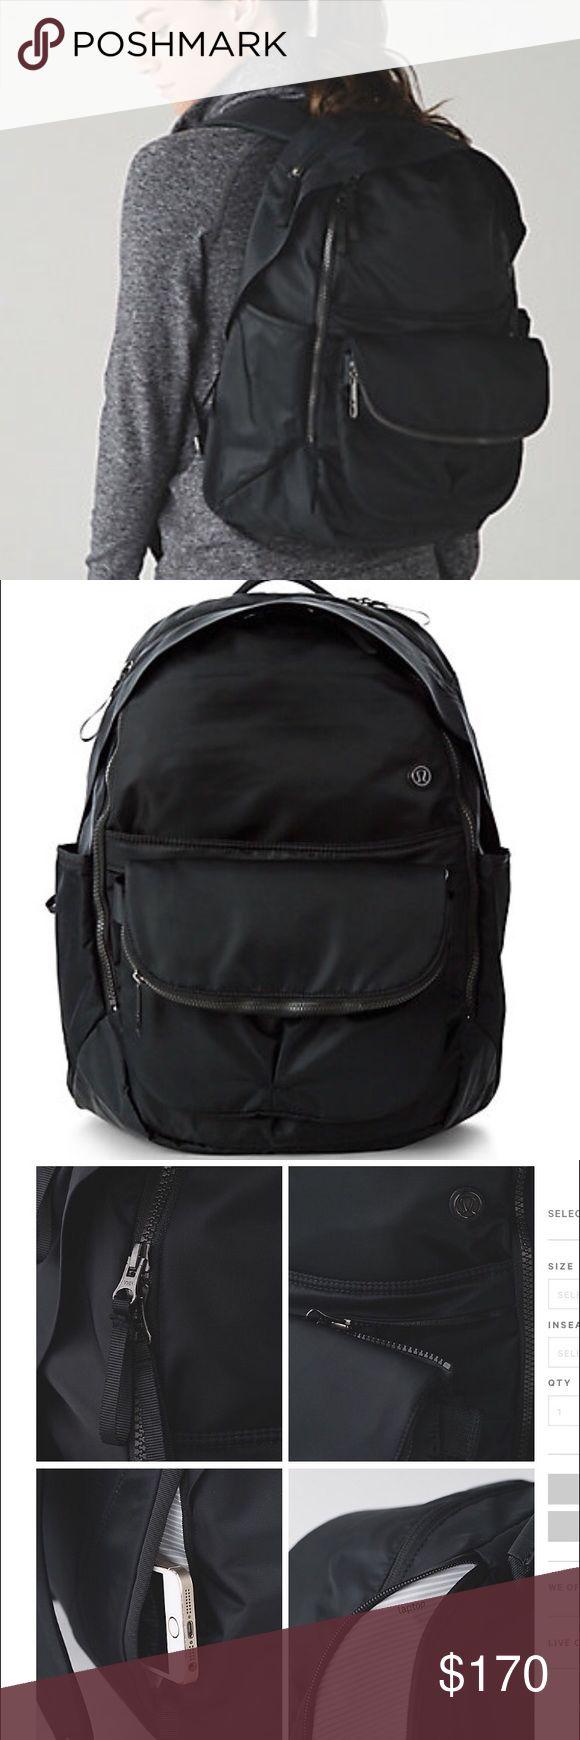 25 best ideas about kipling backpack on pinterest school handbags - Lululemon All Day Backpack